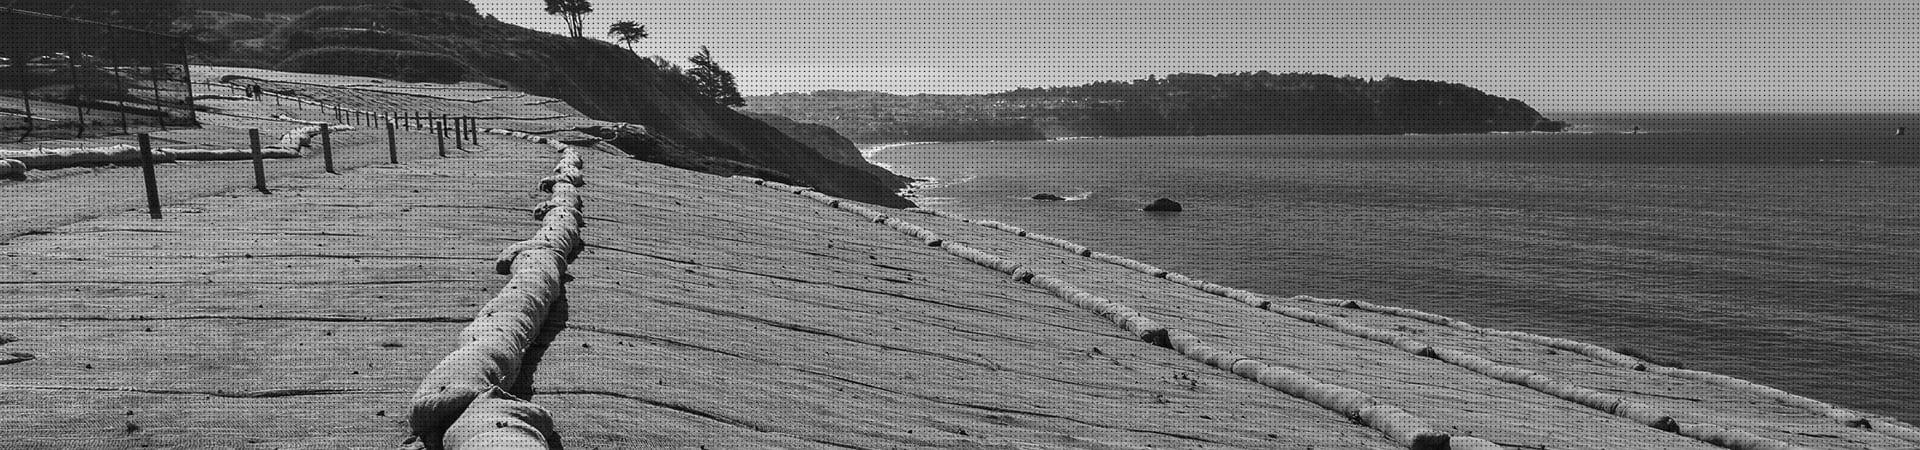 erosion-control-perth-western-australia-slider